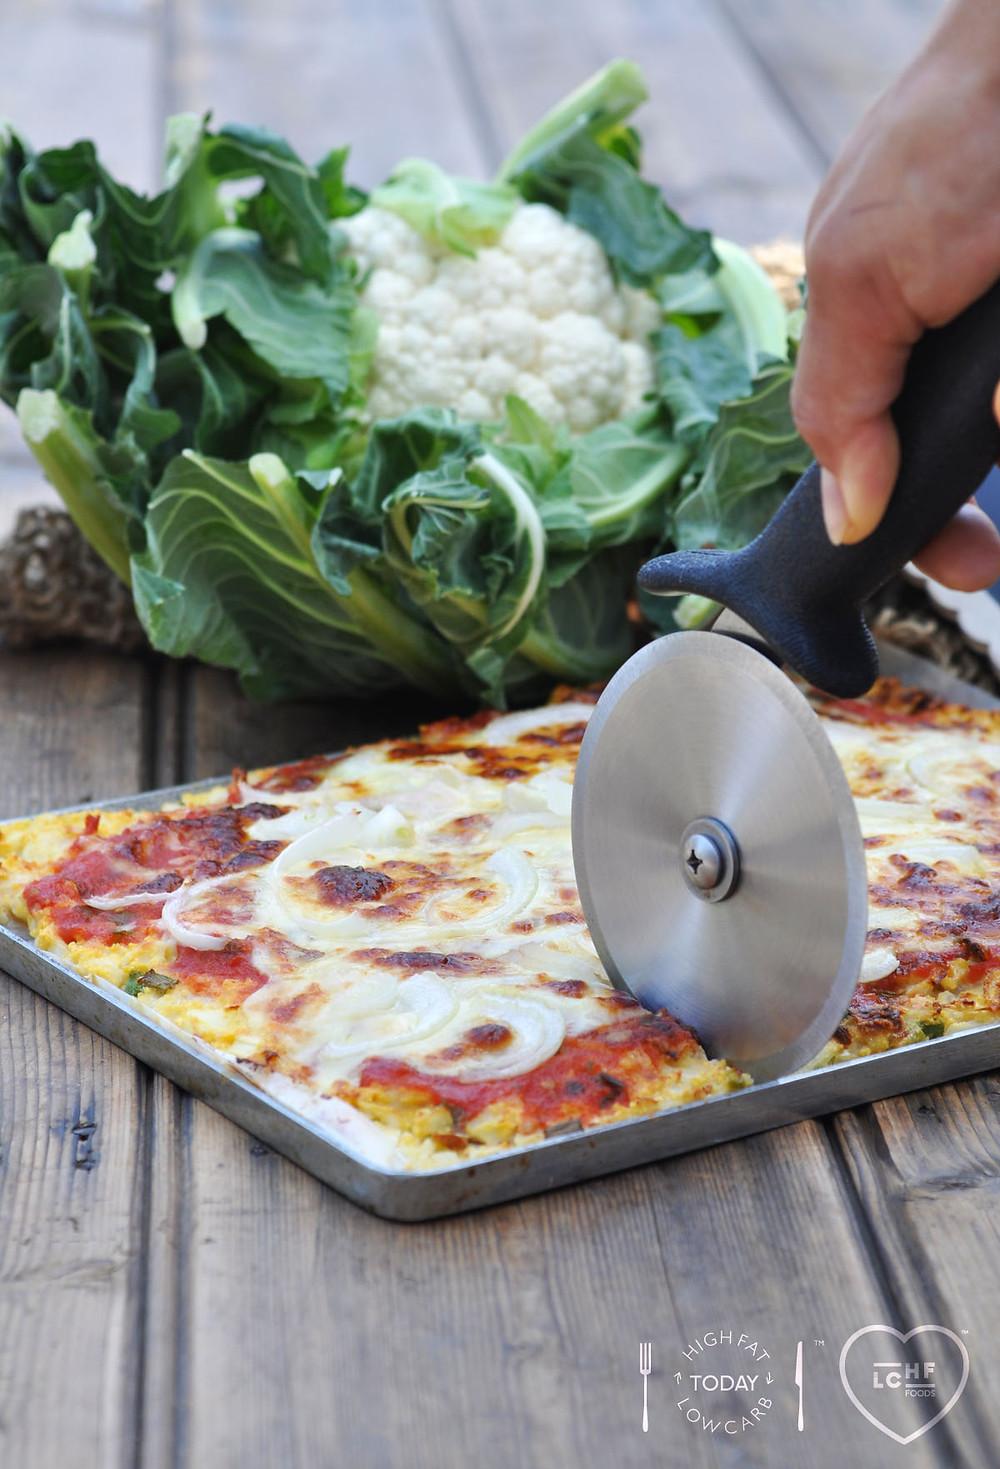 CYMAZZA Cauliflower style Pizza